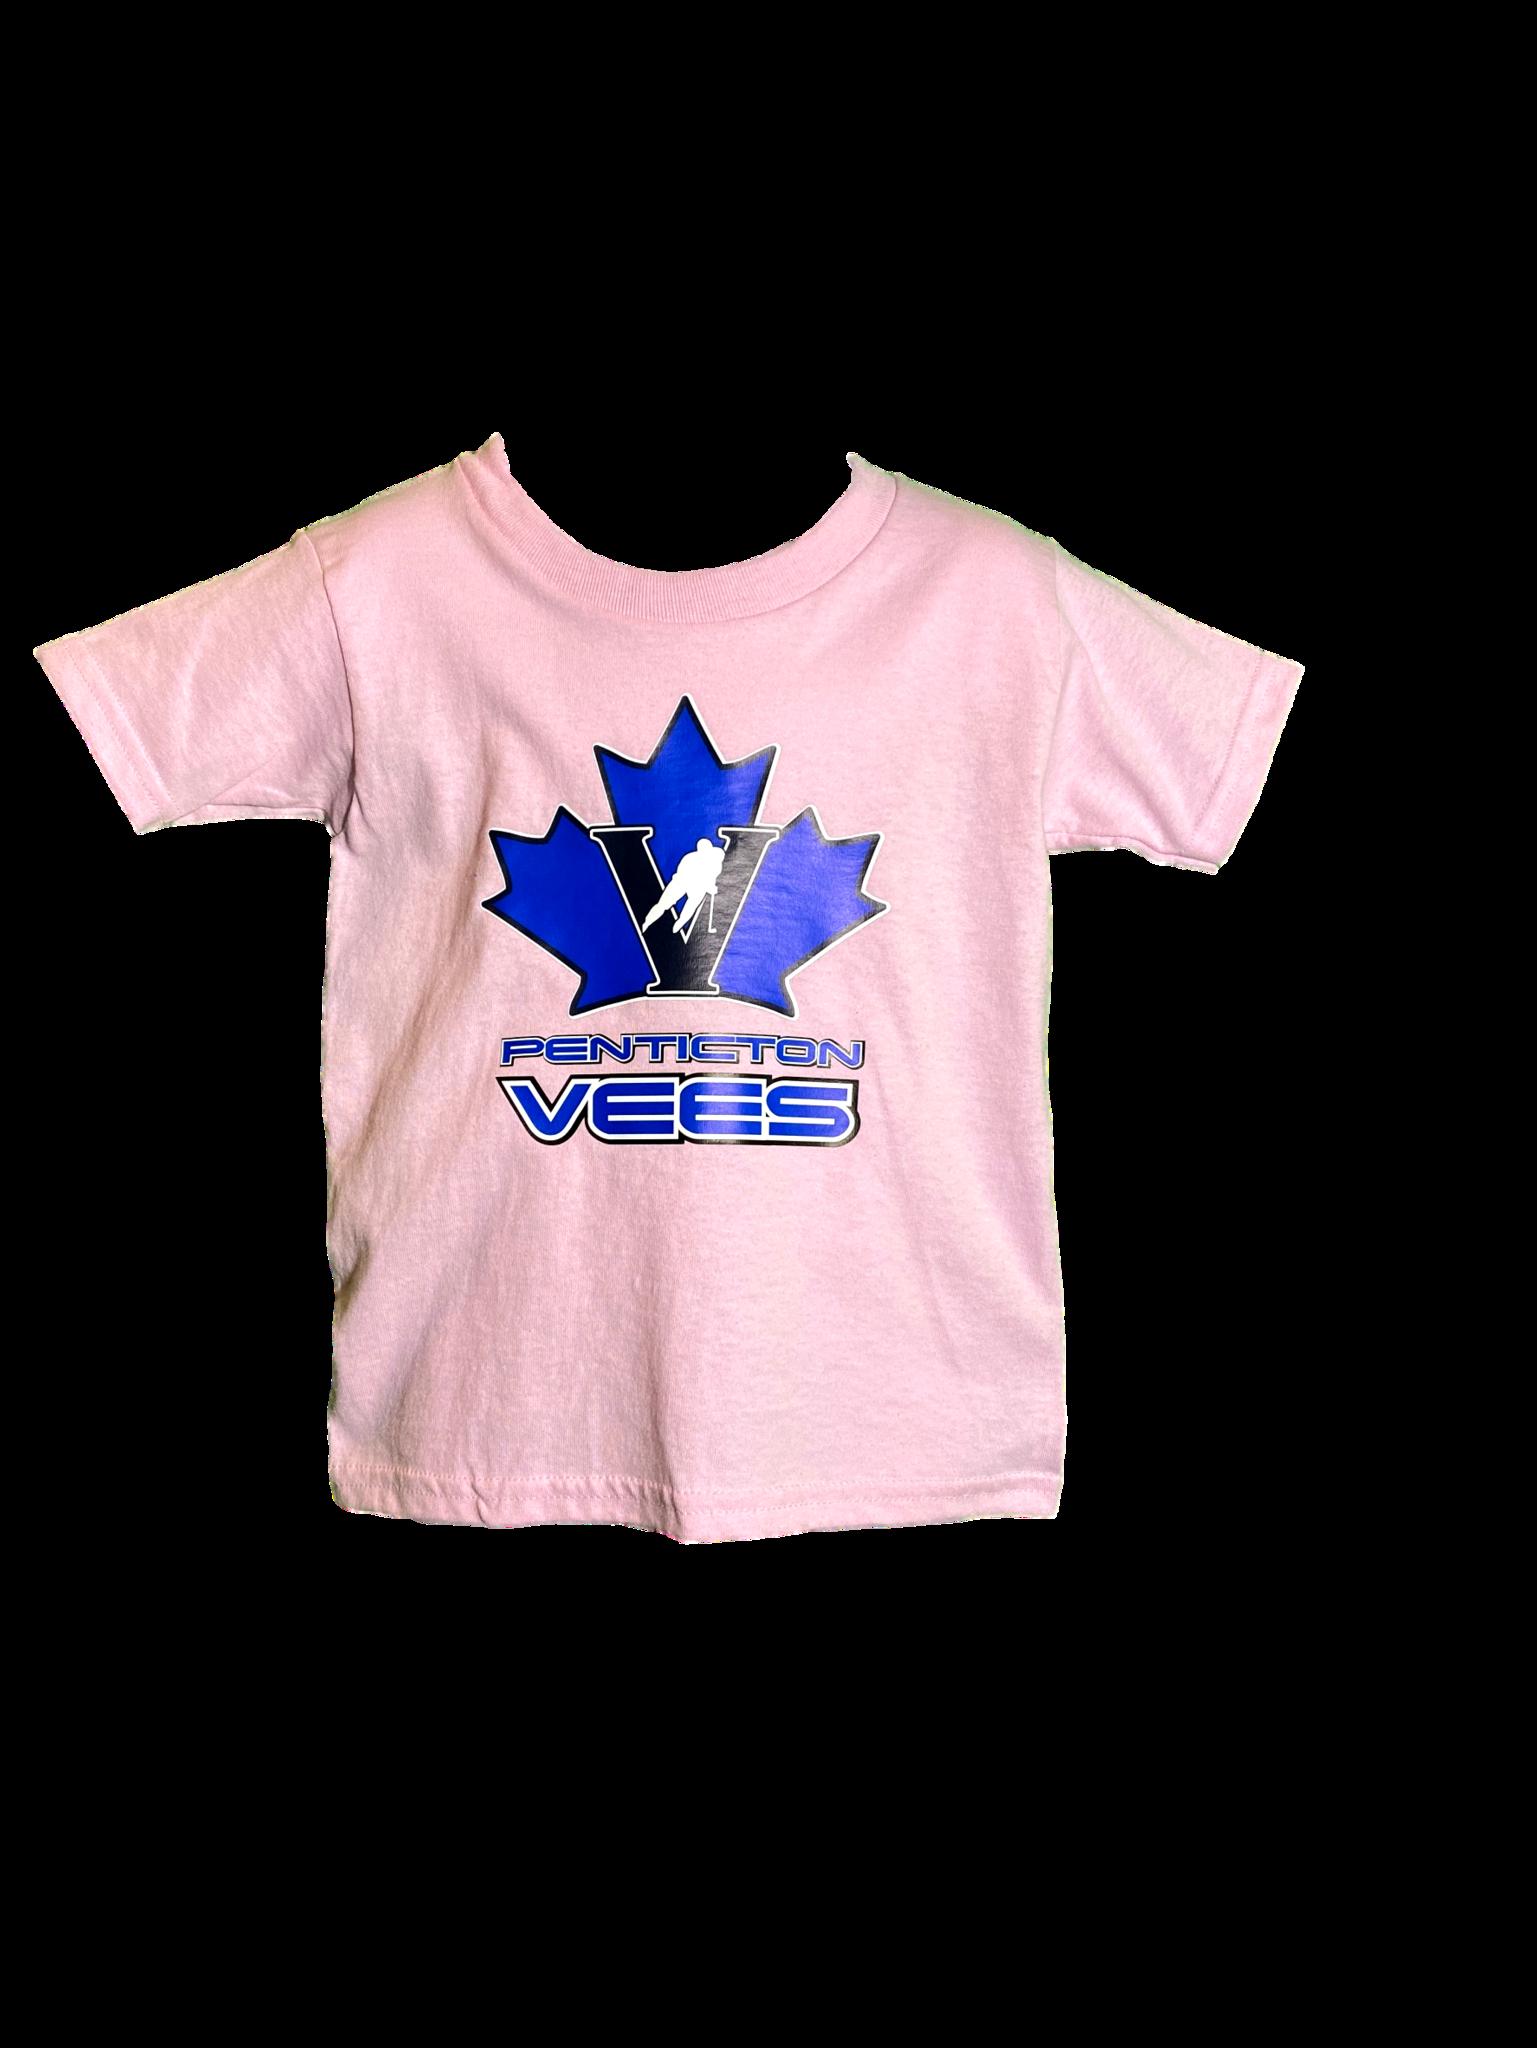 Gilden Vees Toddler T Shirt- Pink